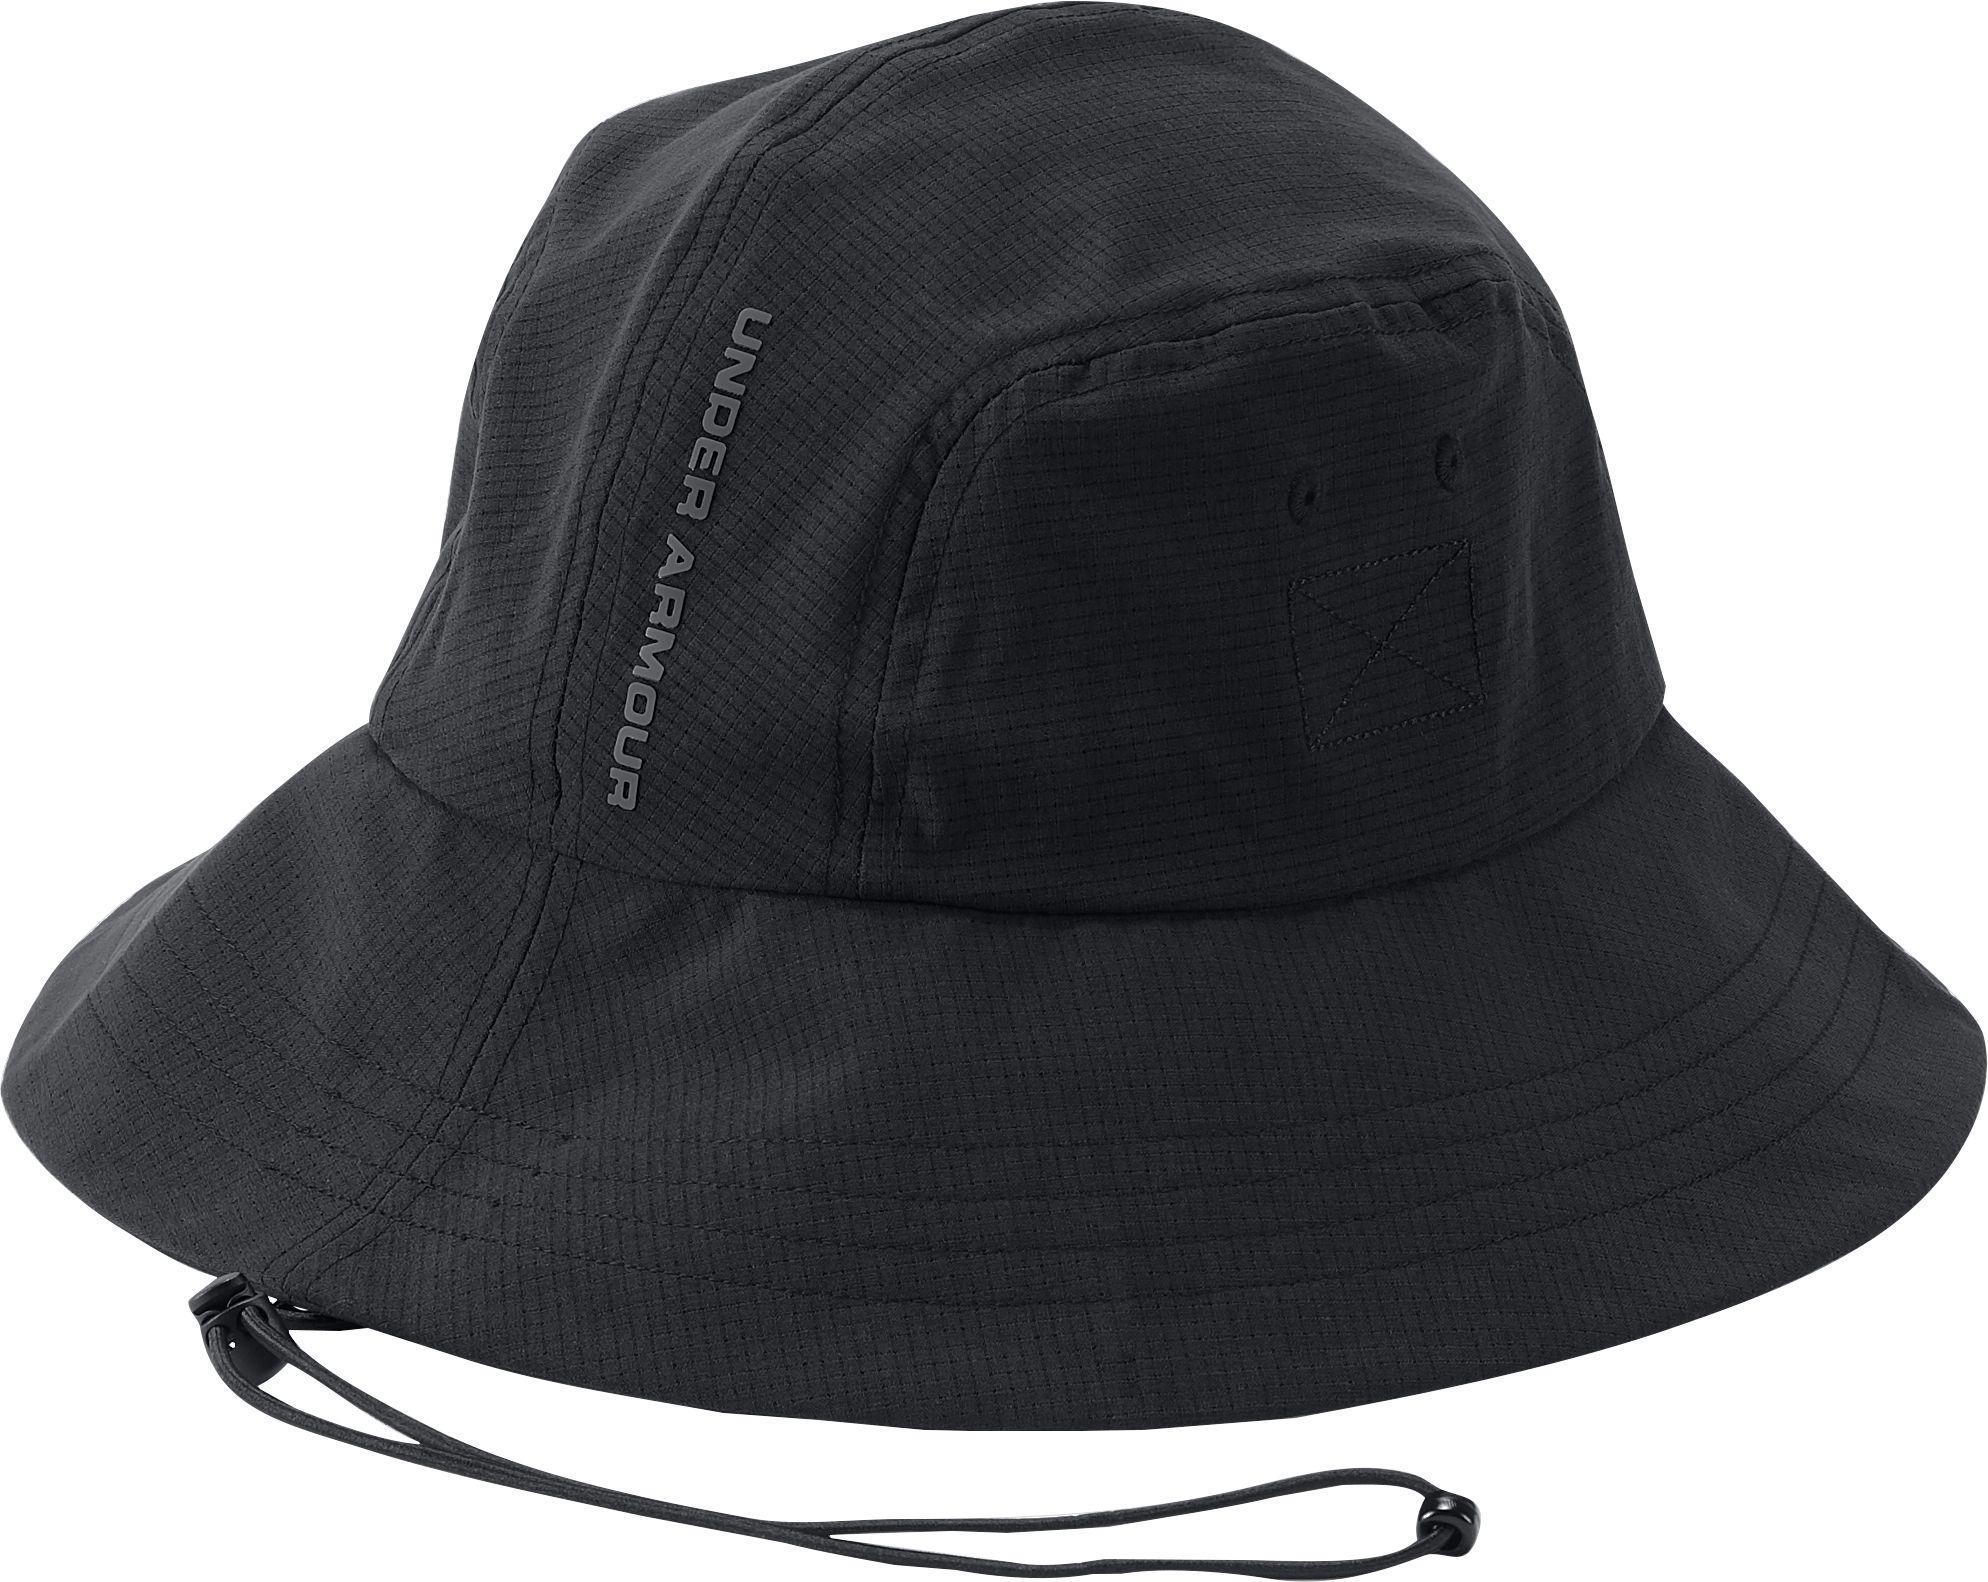 Under Armour - Black Armourvent Bucket 2.0 Hat for Men - Lyst. View  fullscreen 52ece3f4fd2c